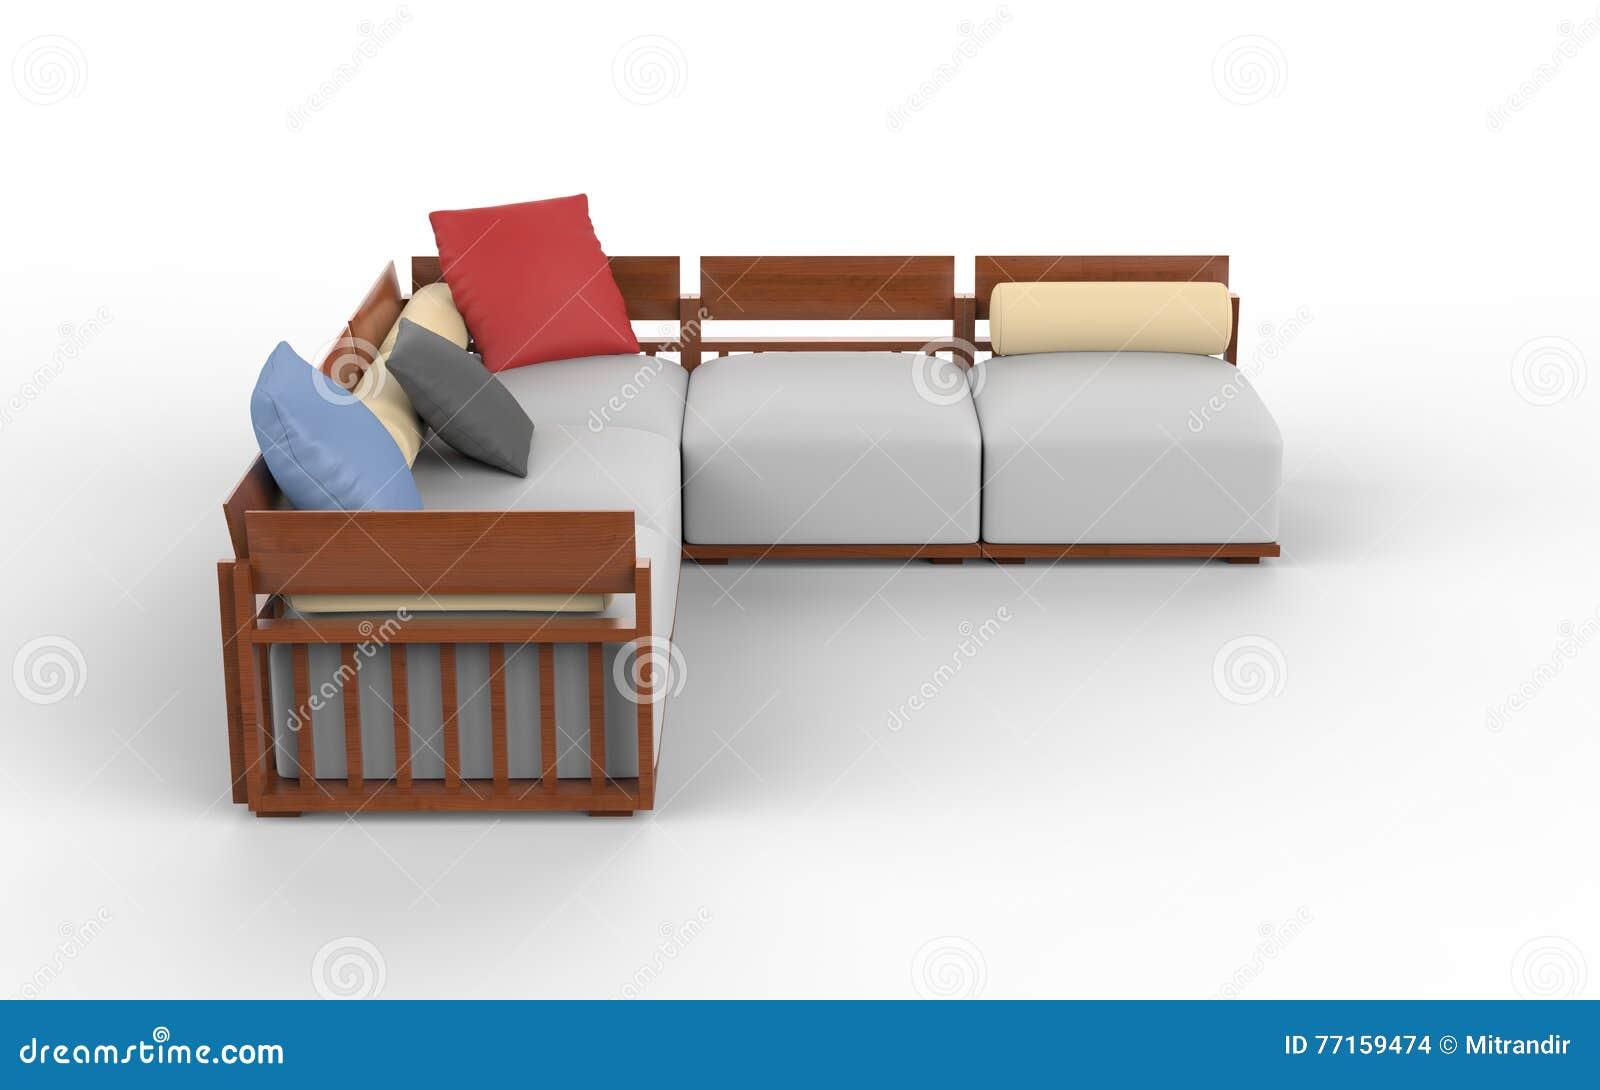 Stupendous Cool Modern Corner Furniture Set Stock Photo Image Of Home Interior Design Ideas Gentotryabchikinfo